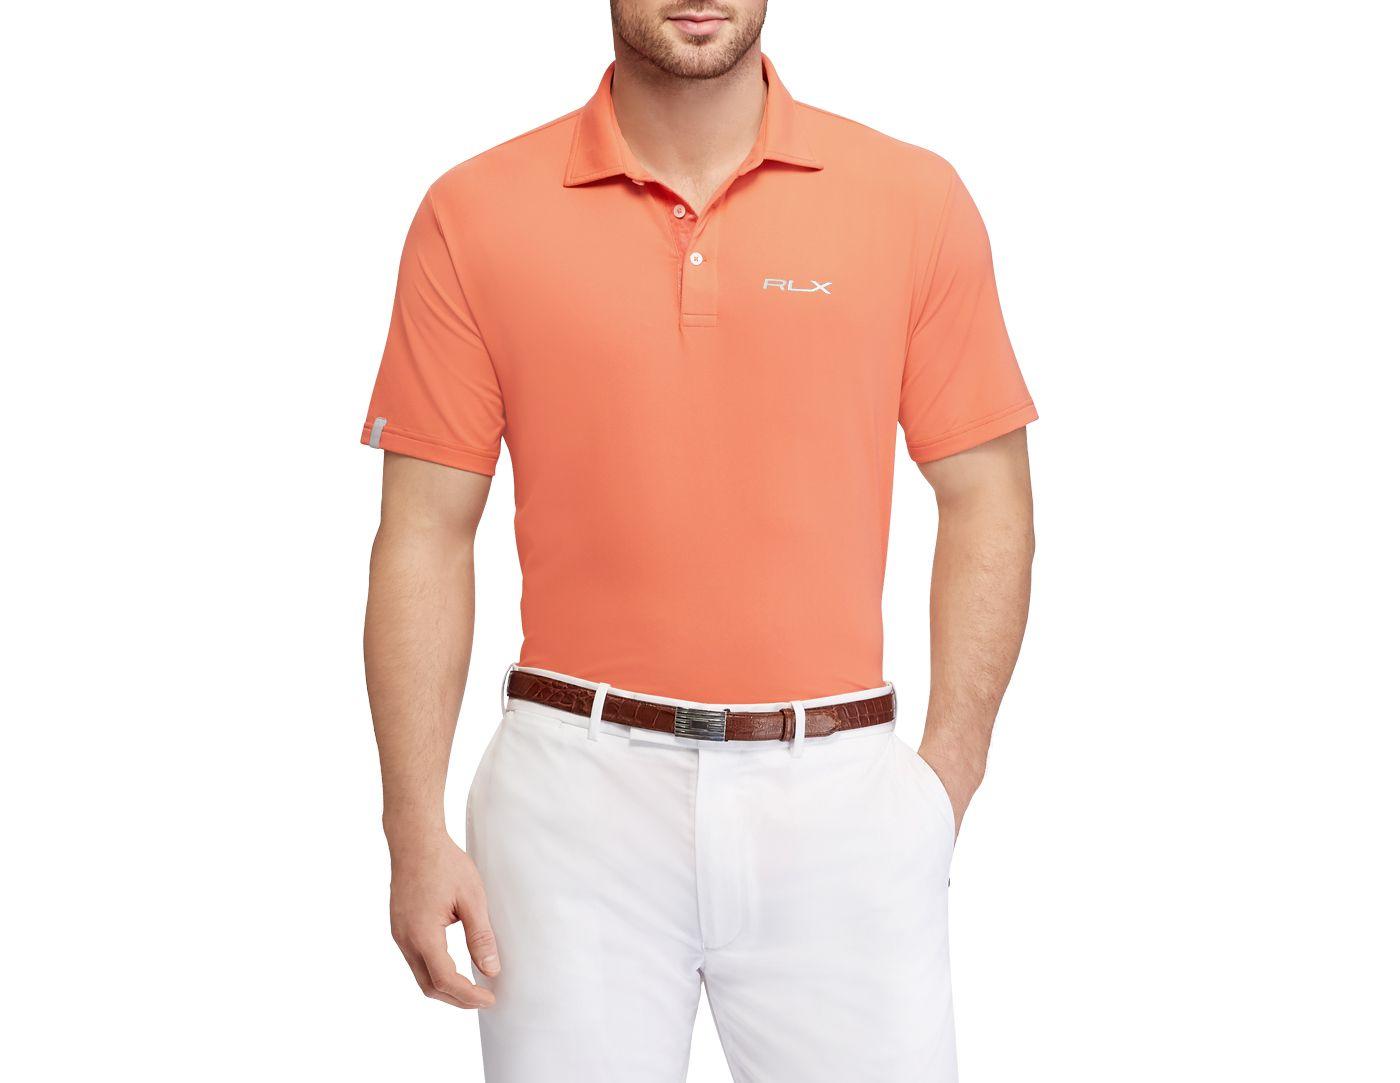 RLX Golf Men's Short Sleeve Solid Airflow Performance Golf Polo